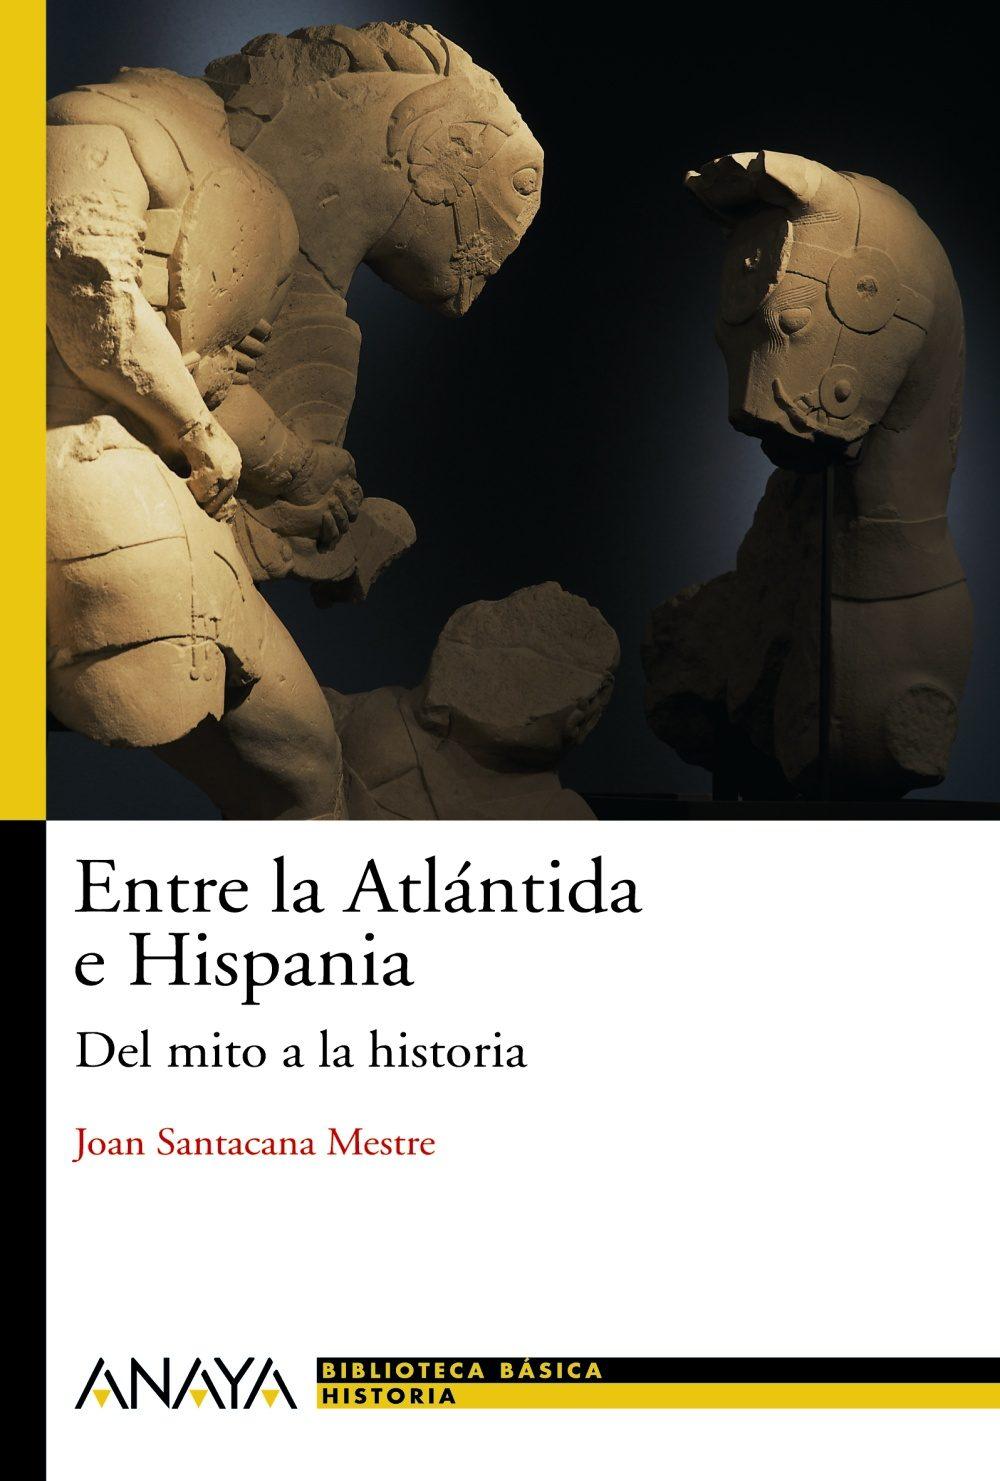 Entre La Atlantida E Hispania: Del Mito A La Historia - Santacana Joan